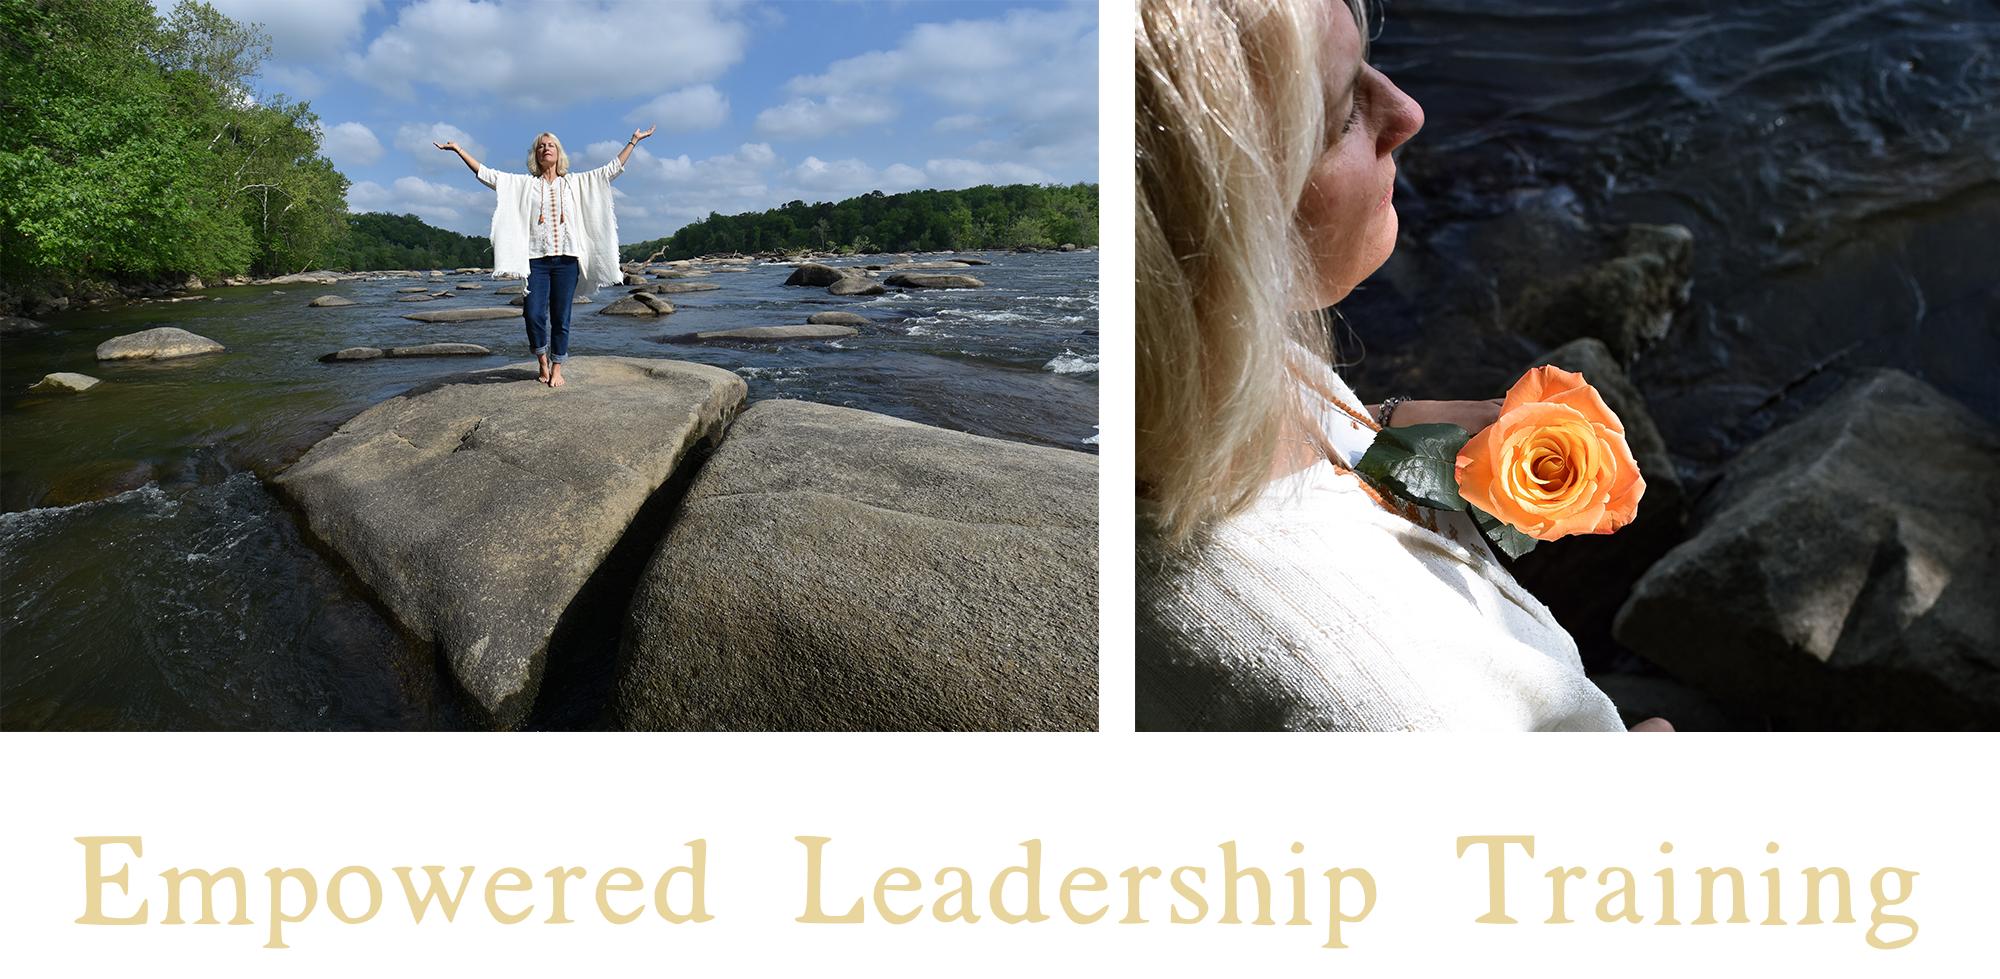 Empowered Leadership Training